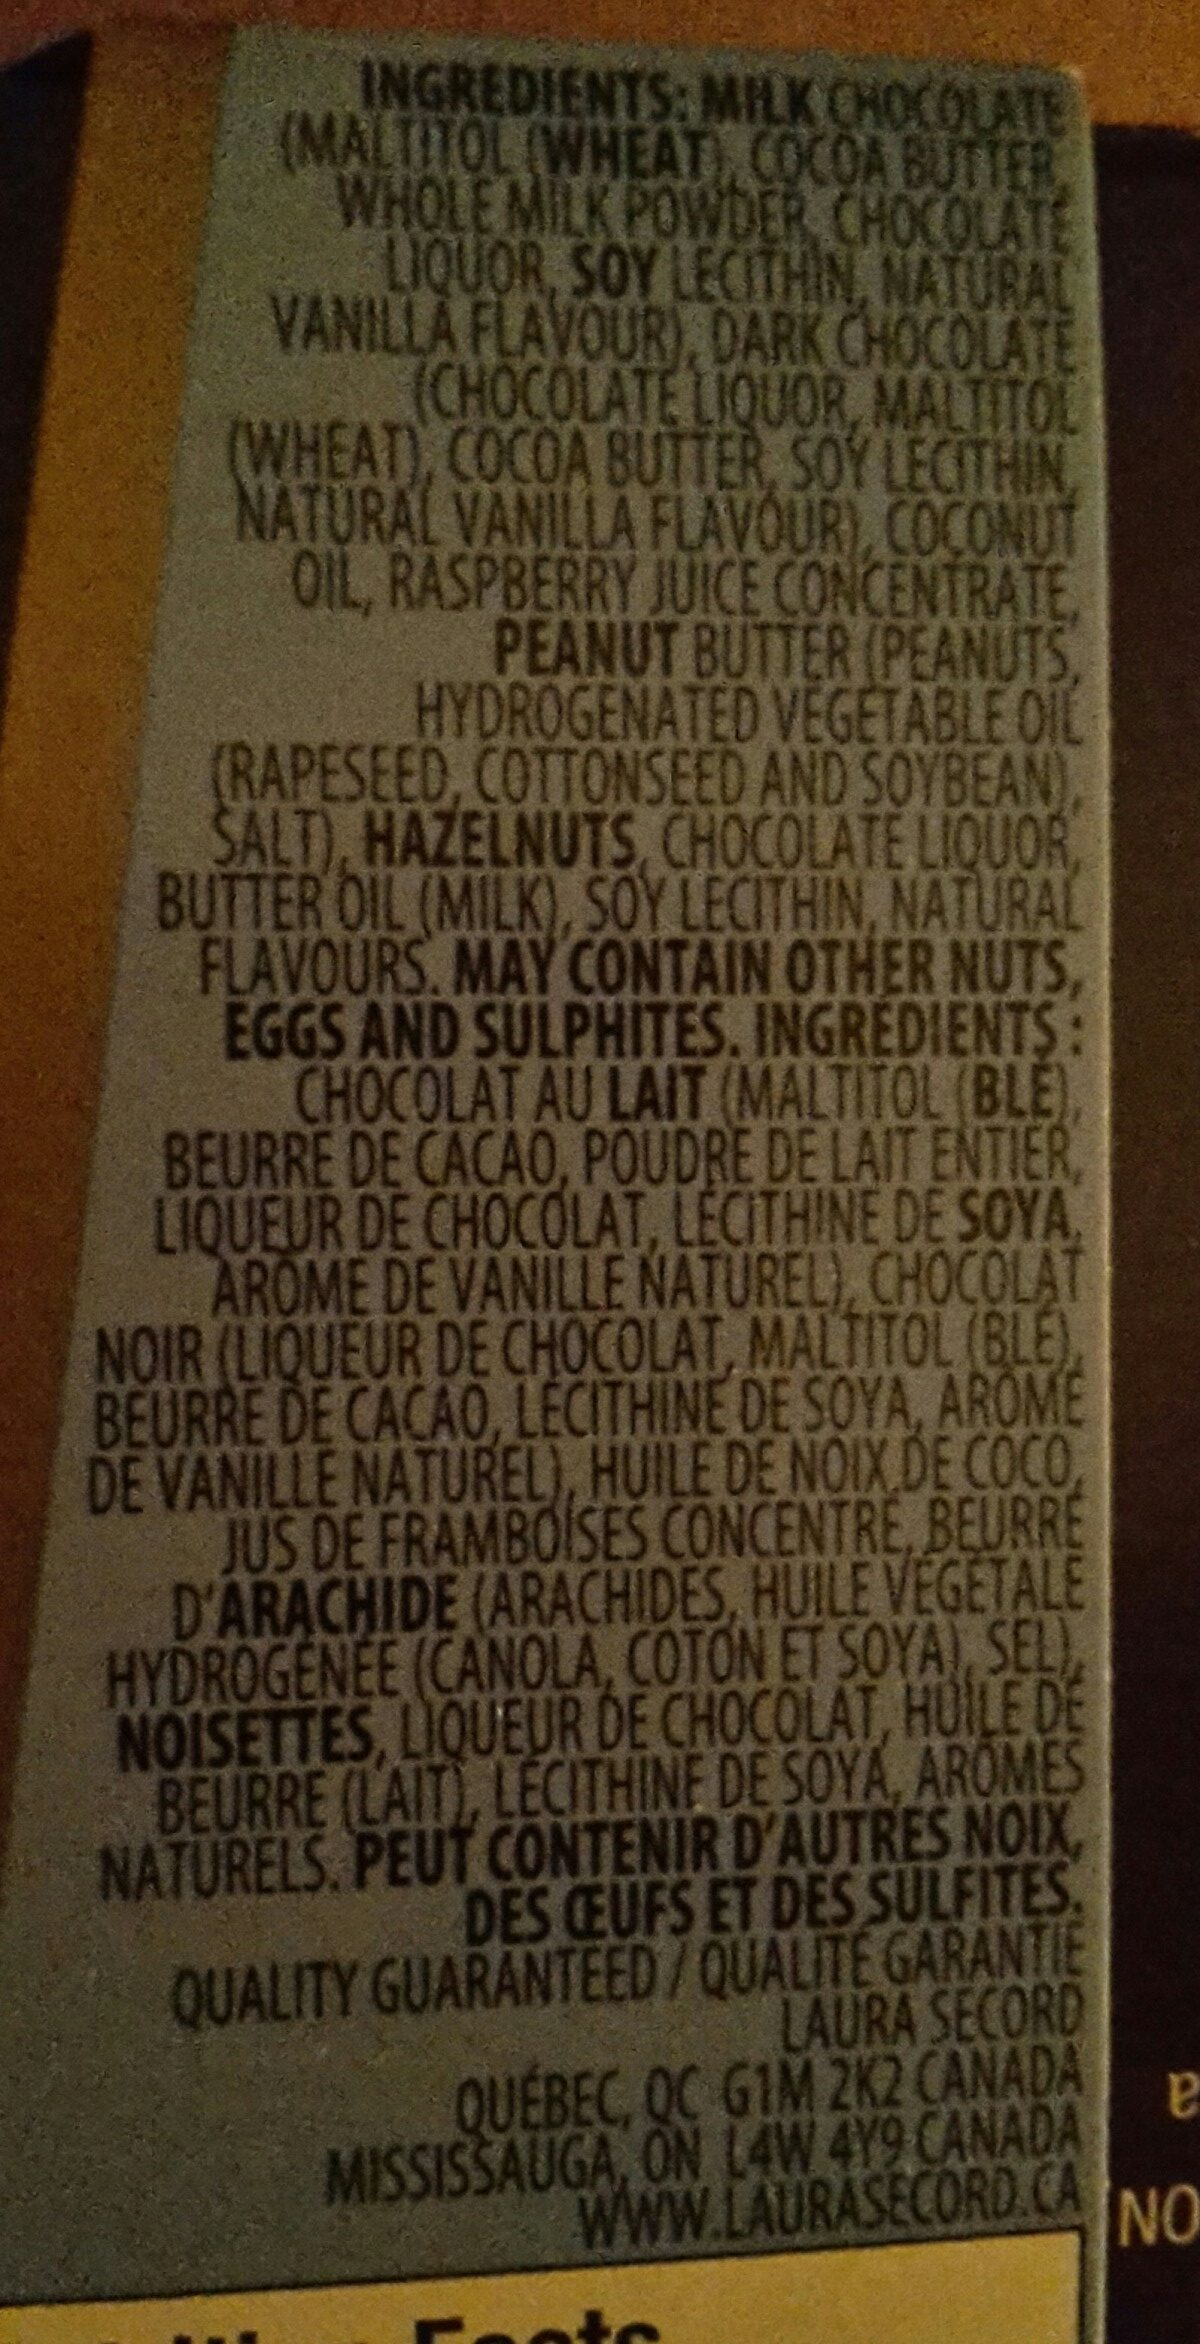 Chocolats - Ingredients - fr